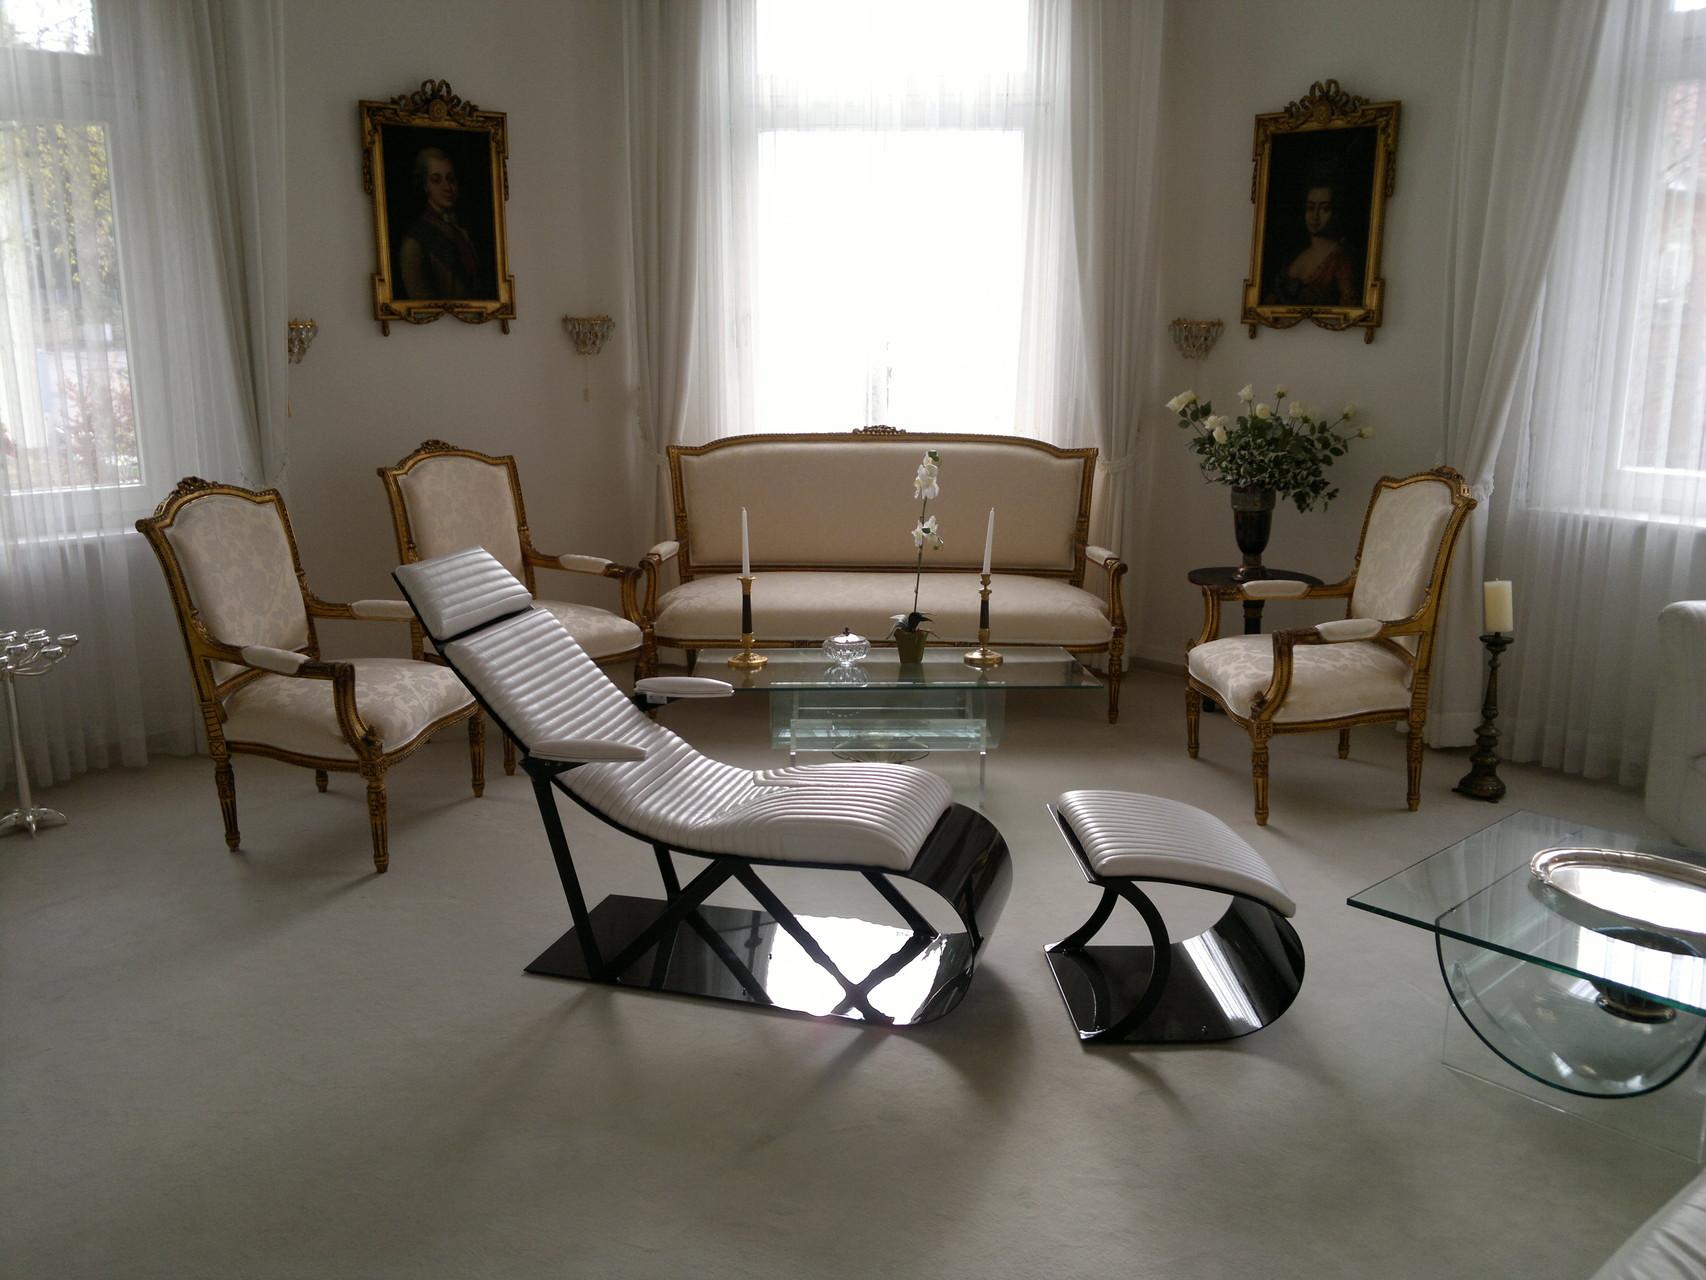 NR Exclusive Carbon Fiber Design Lounge Chair--Timeless Design